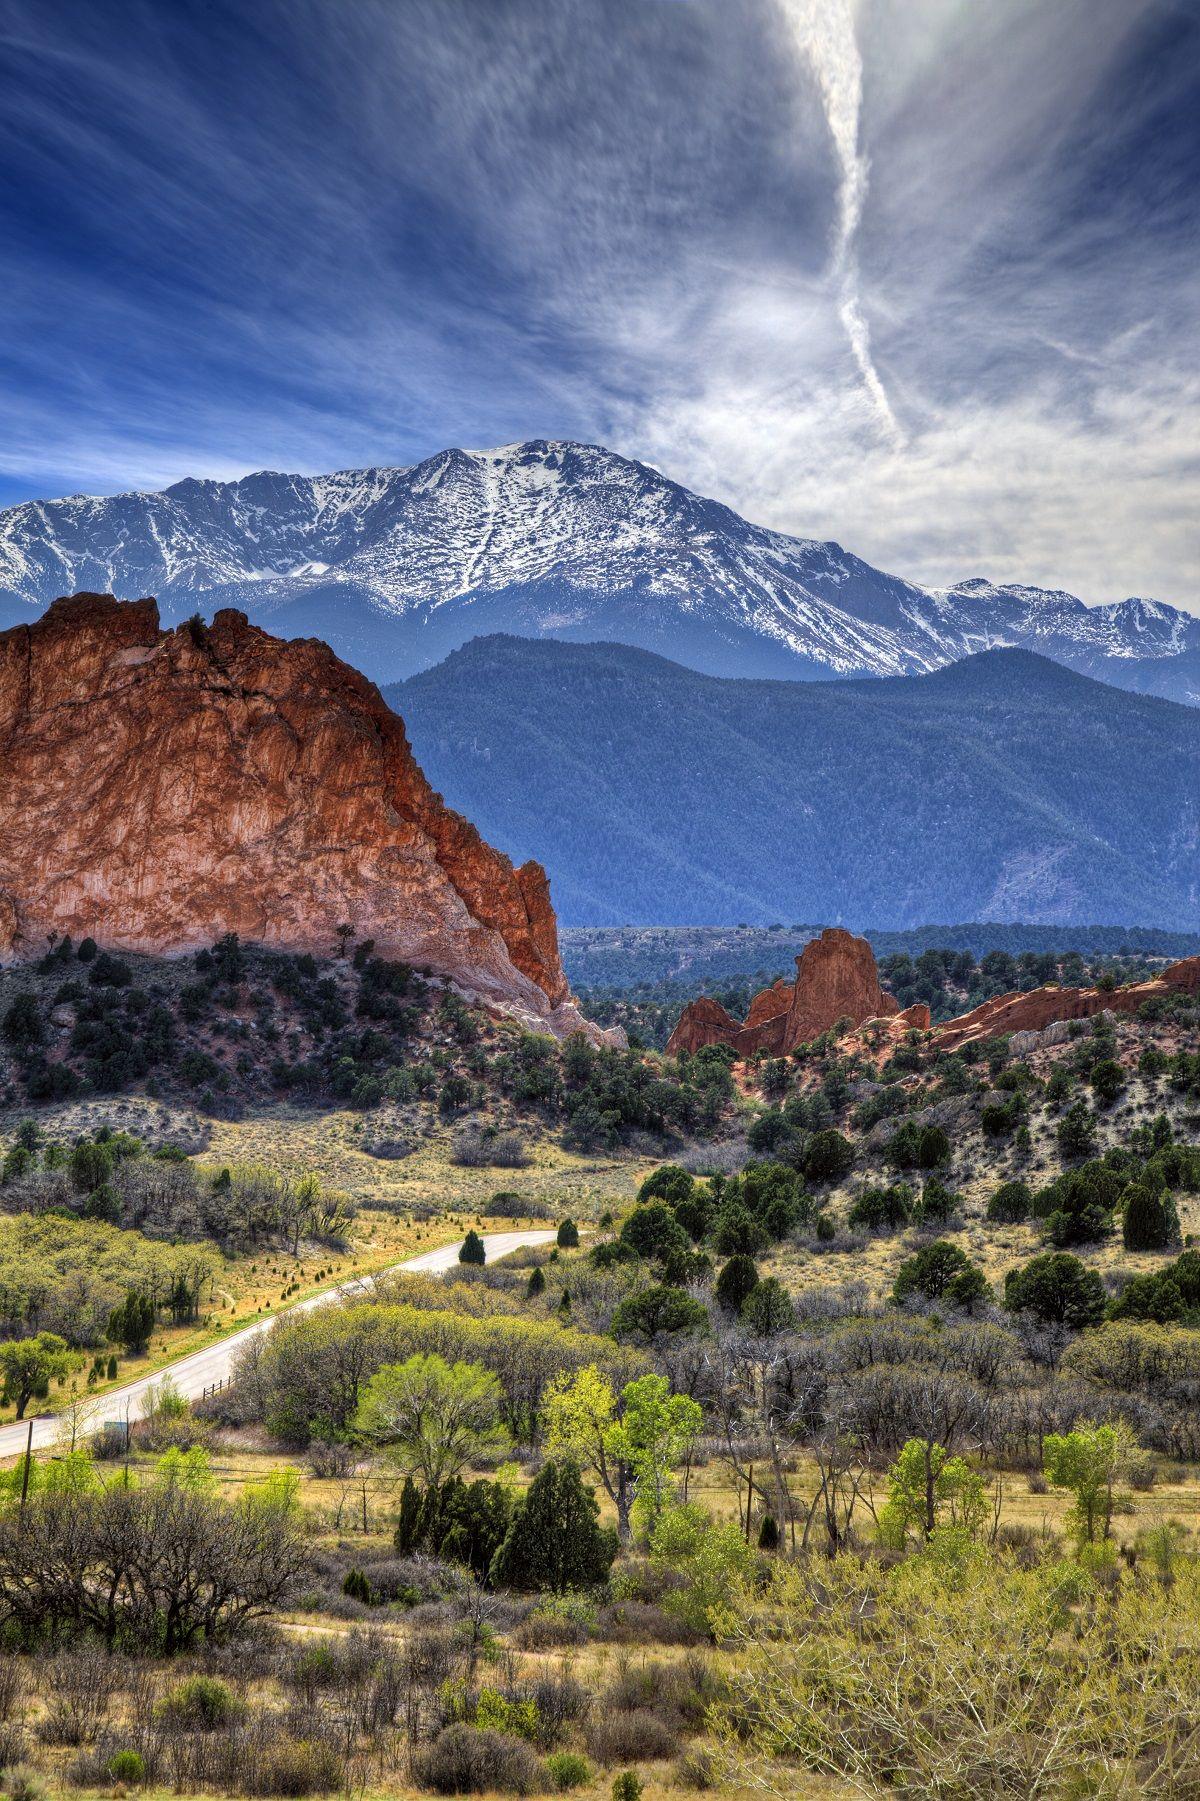 Just outside of Colorado Springs, the towering Pikes Peak